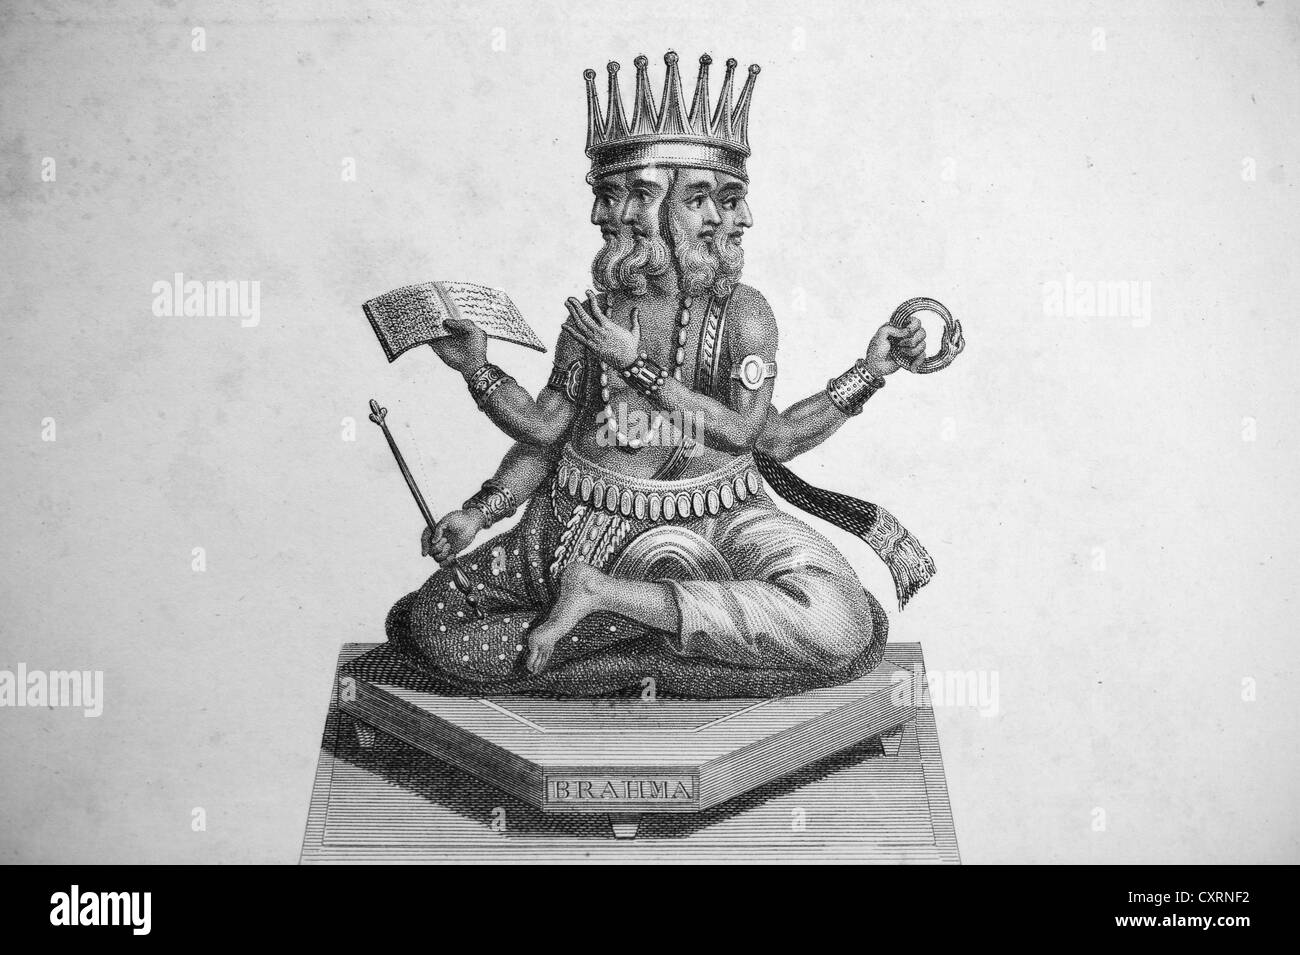 Brahma, Hindu deity, India, engraving, London - Stock Image